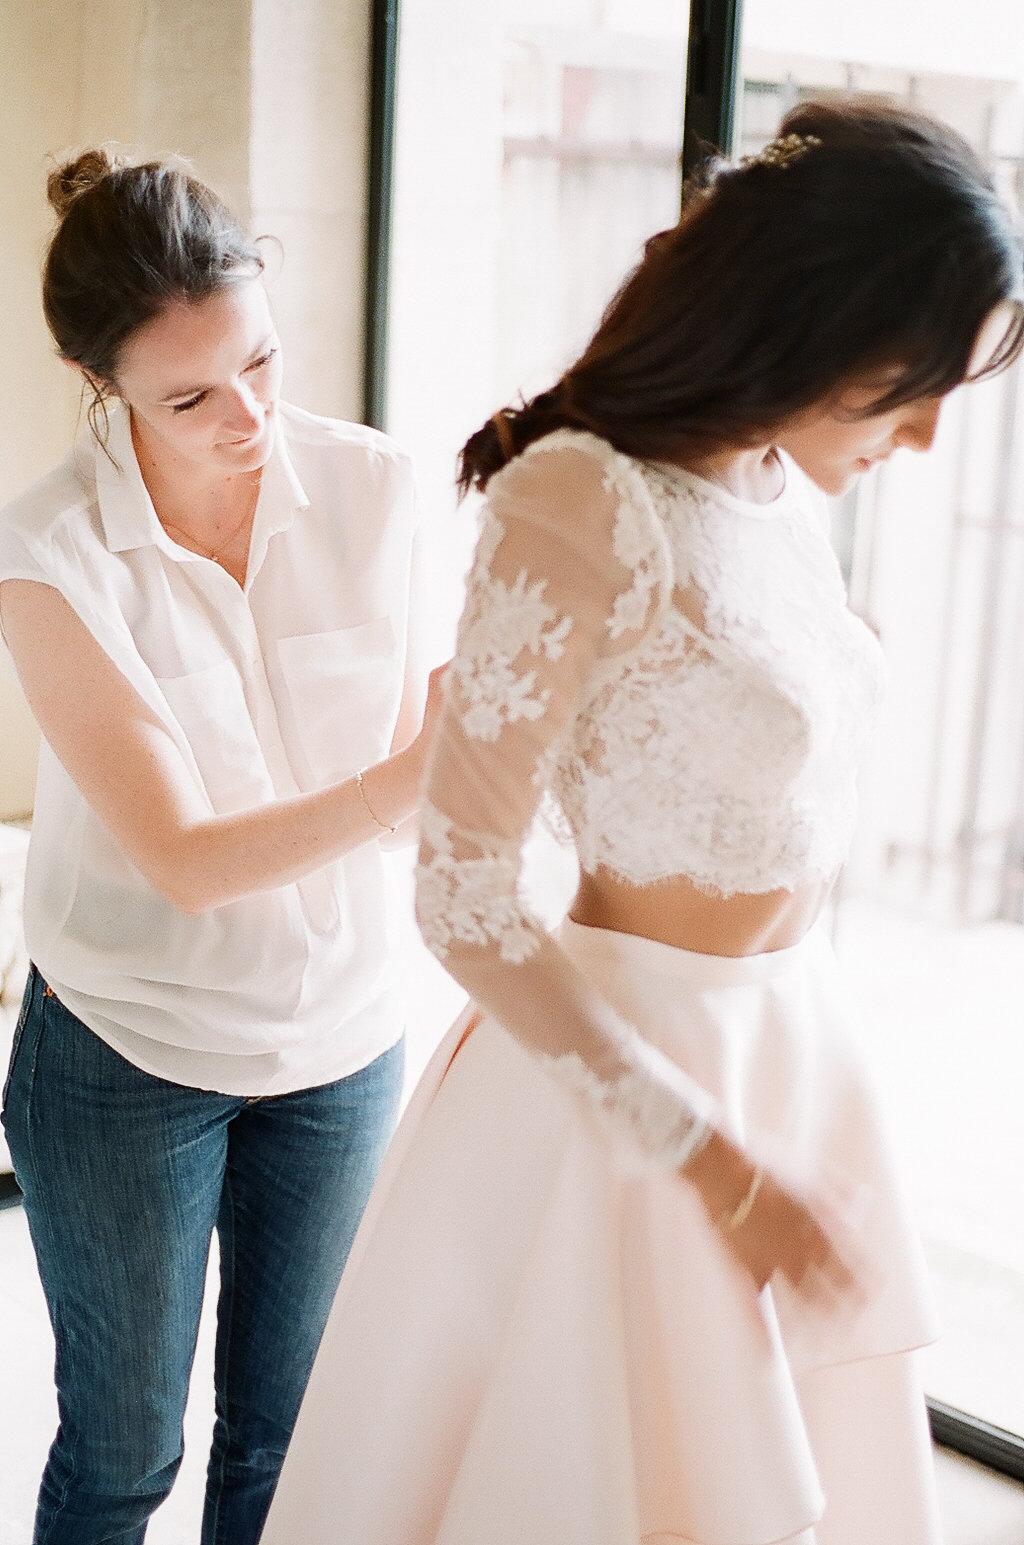 le coeur dans les etoiles - wedding planner - provence - luberon - alpilles - drome - vaucluse - sardaigne - italie - organisation - mariage - shooting - dolce vita - valery villard-129